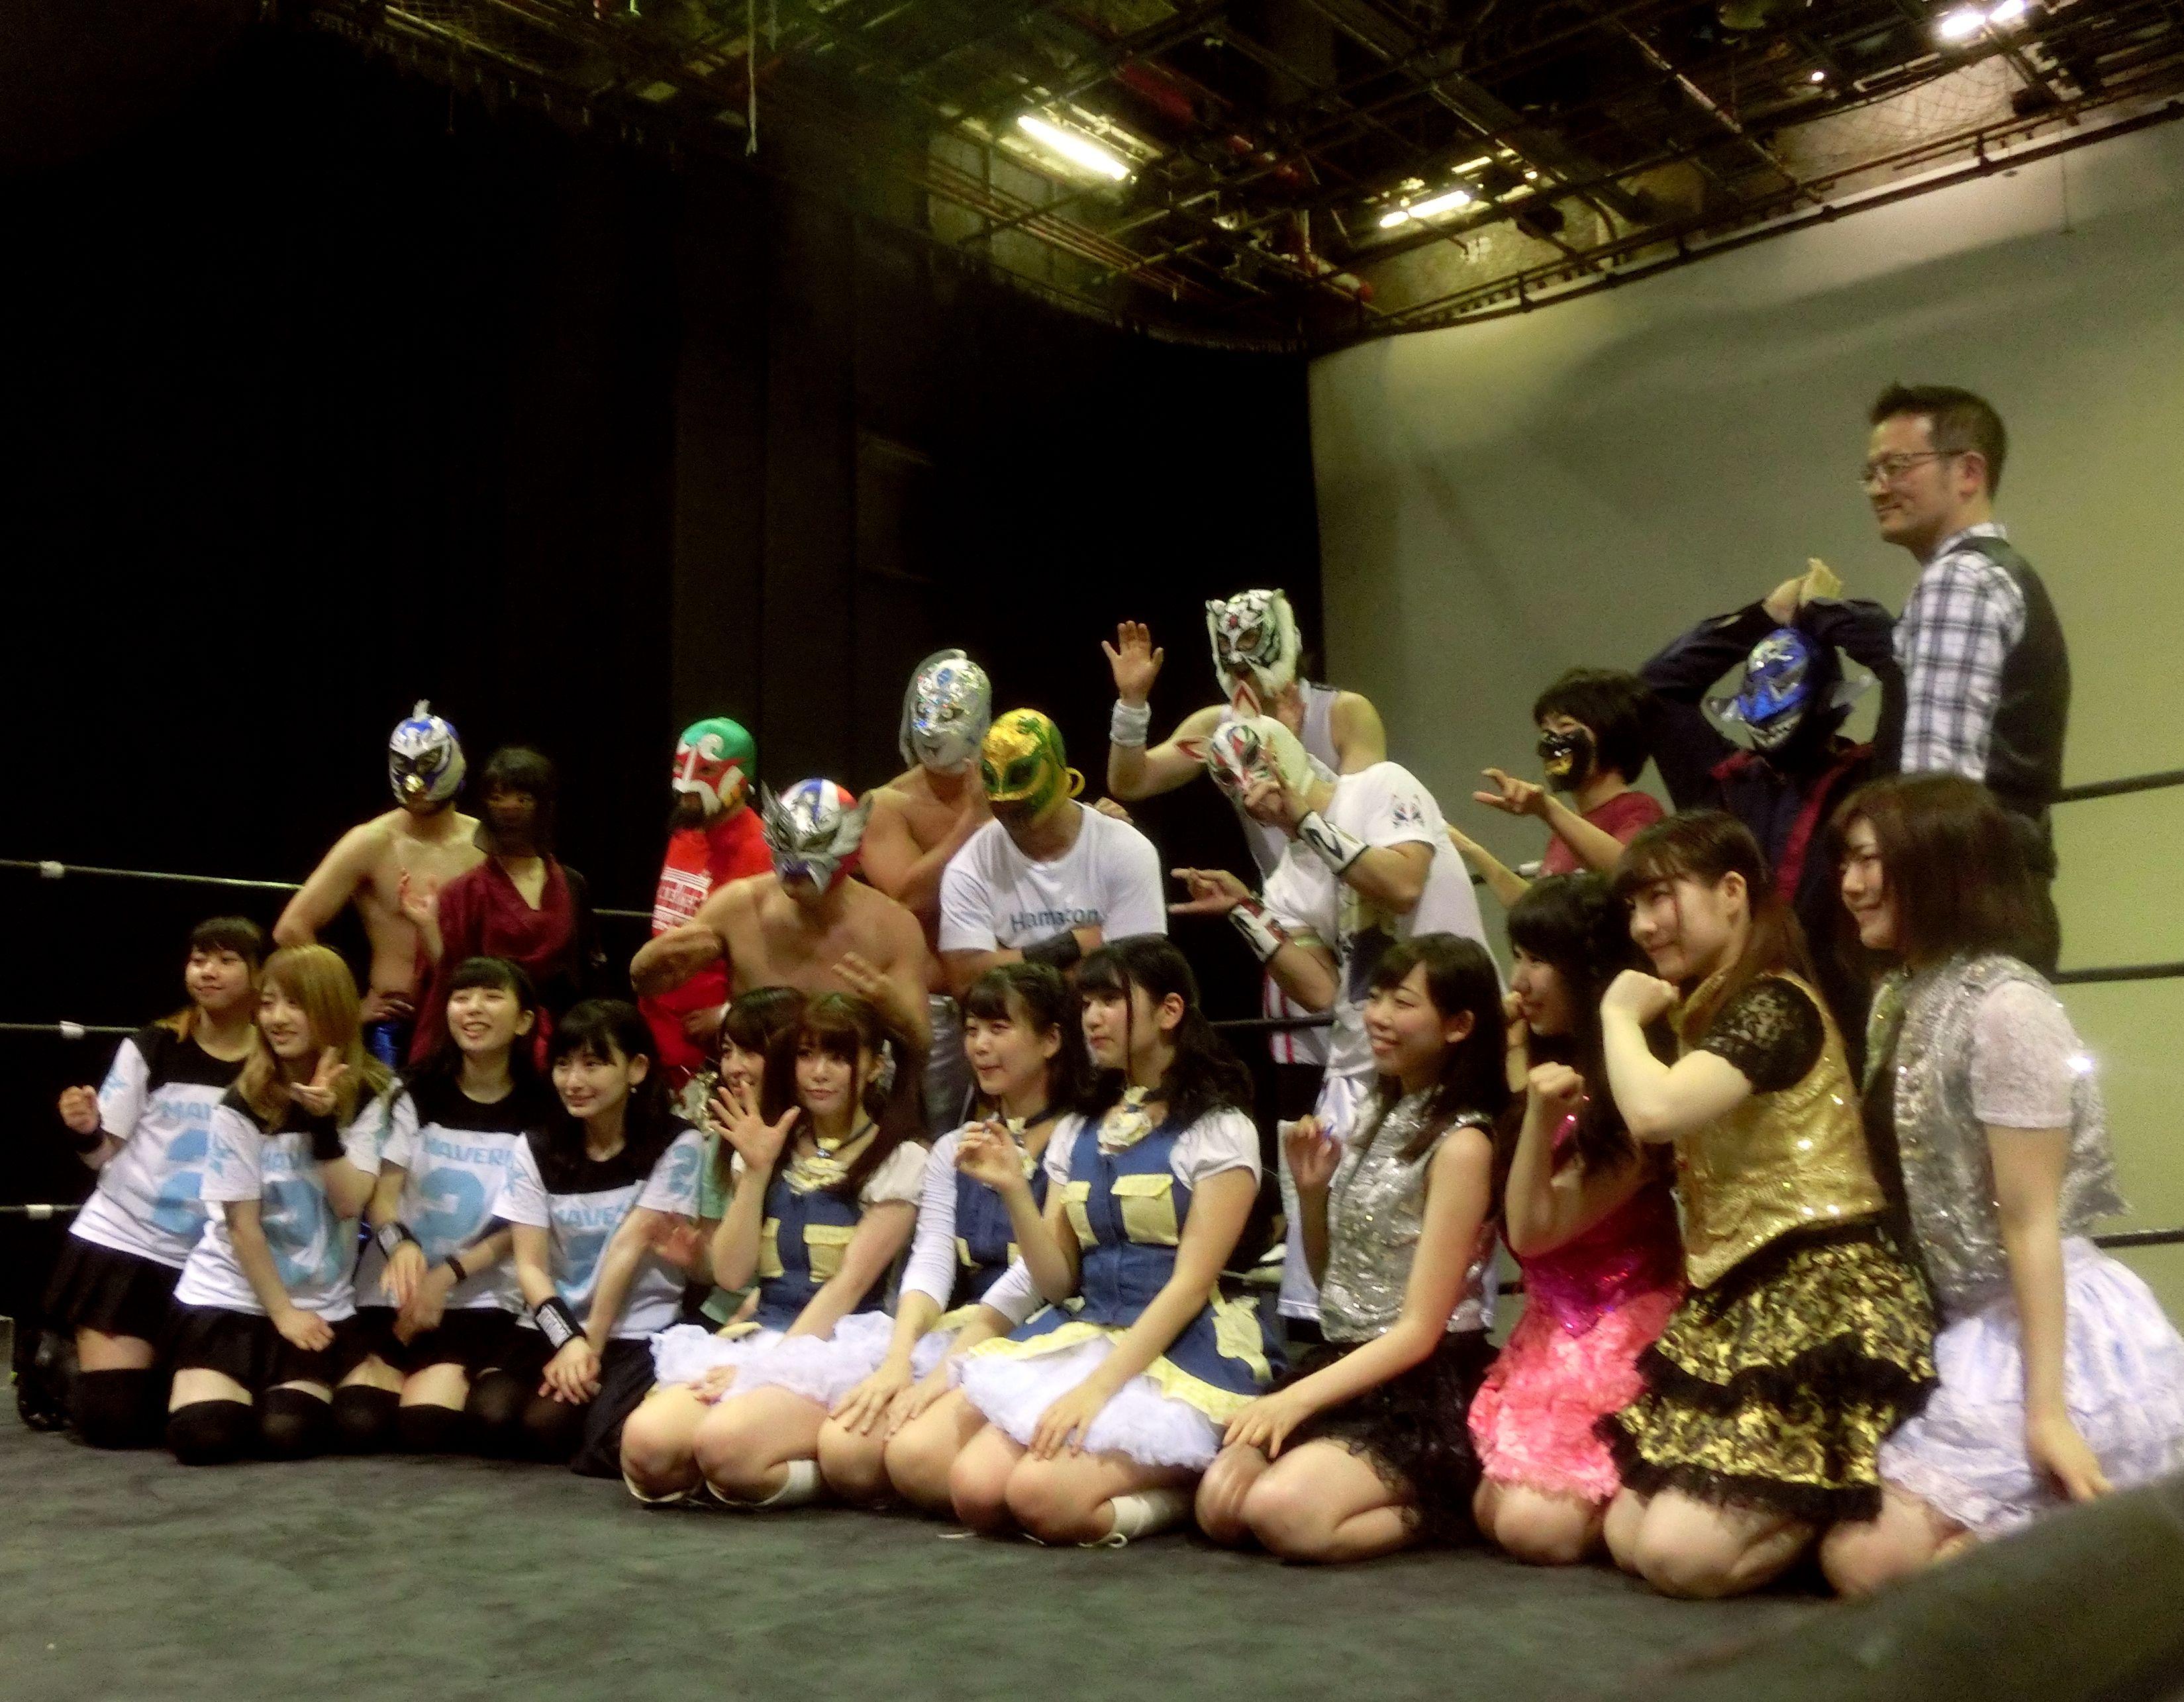 「MAVERICK」が闘い「なら万葉プロレス」が踊った!? 「アイドル×マスクマン 東京アイドル旋風祭×シアタープロレス花鳥風月」